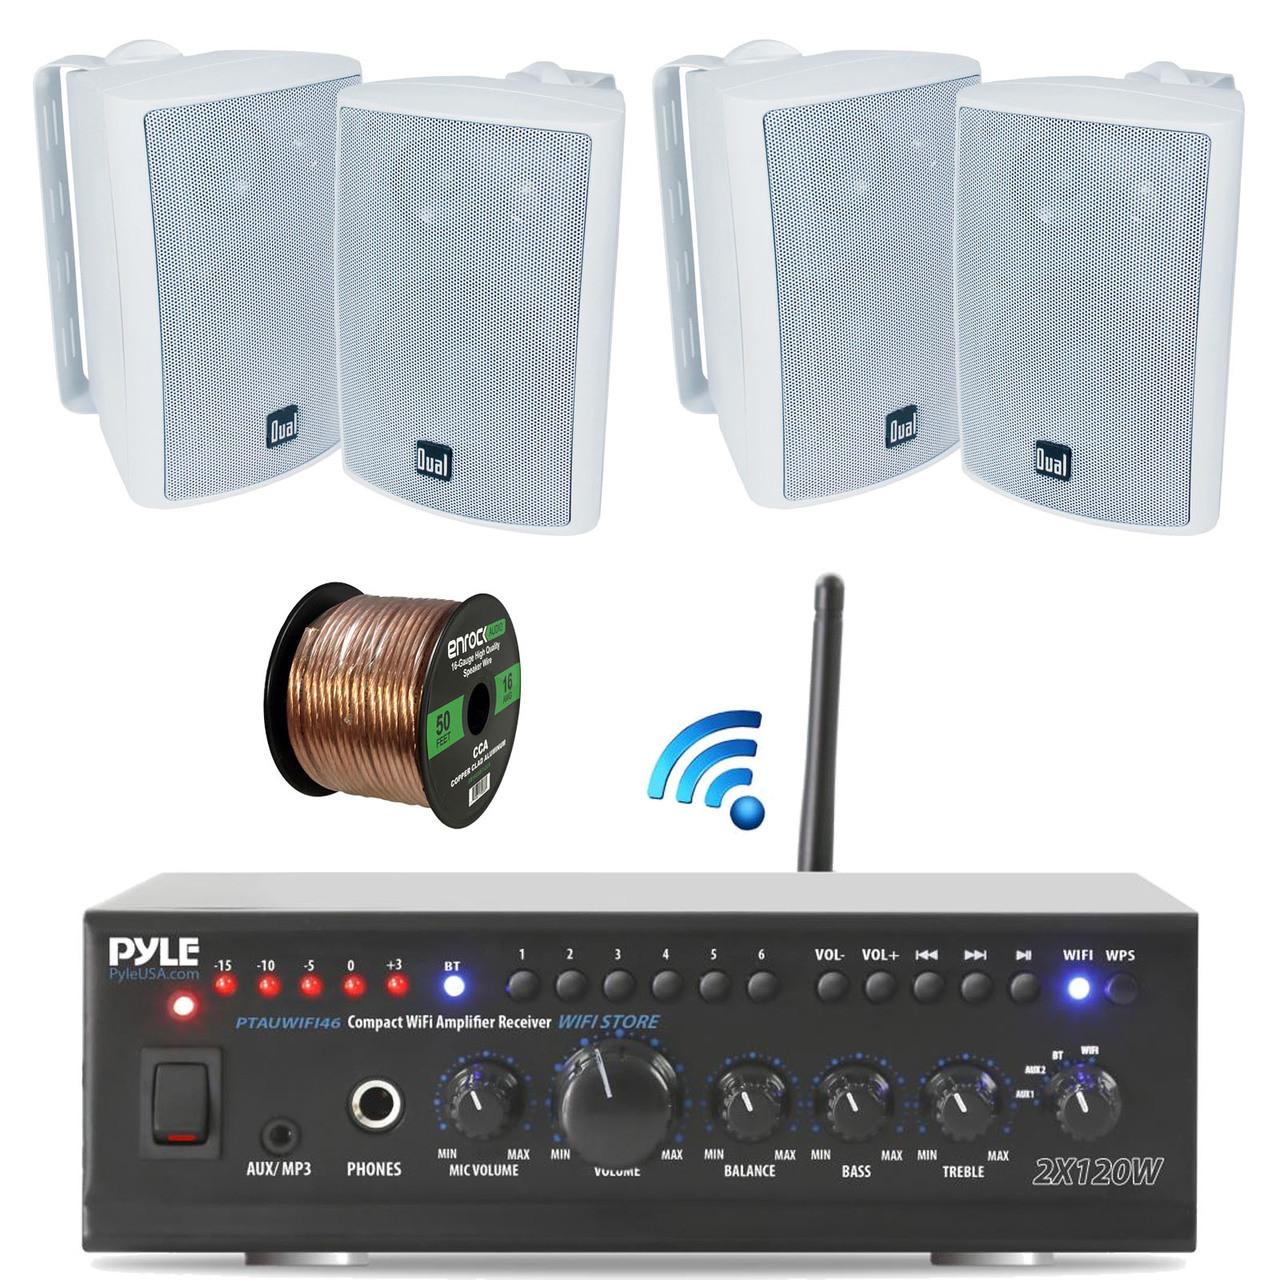 Pyle PTAUWIFI46 WiFi Bluetooth Stereo Amplifier 240-Watt Home ...